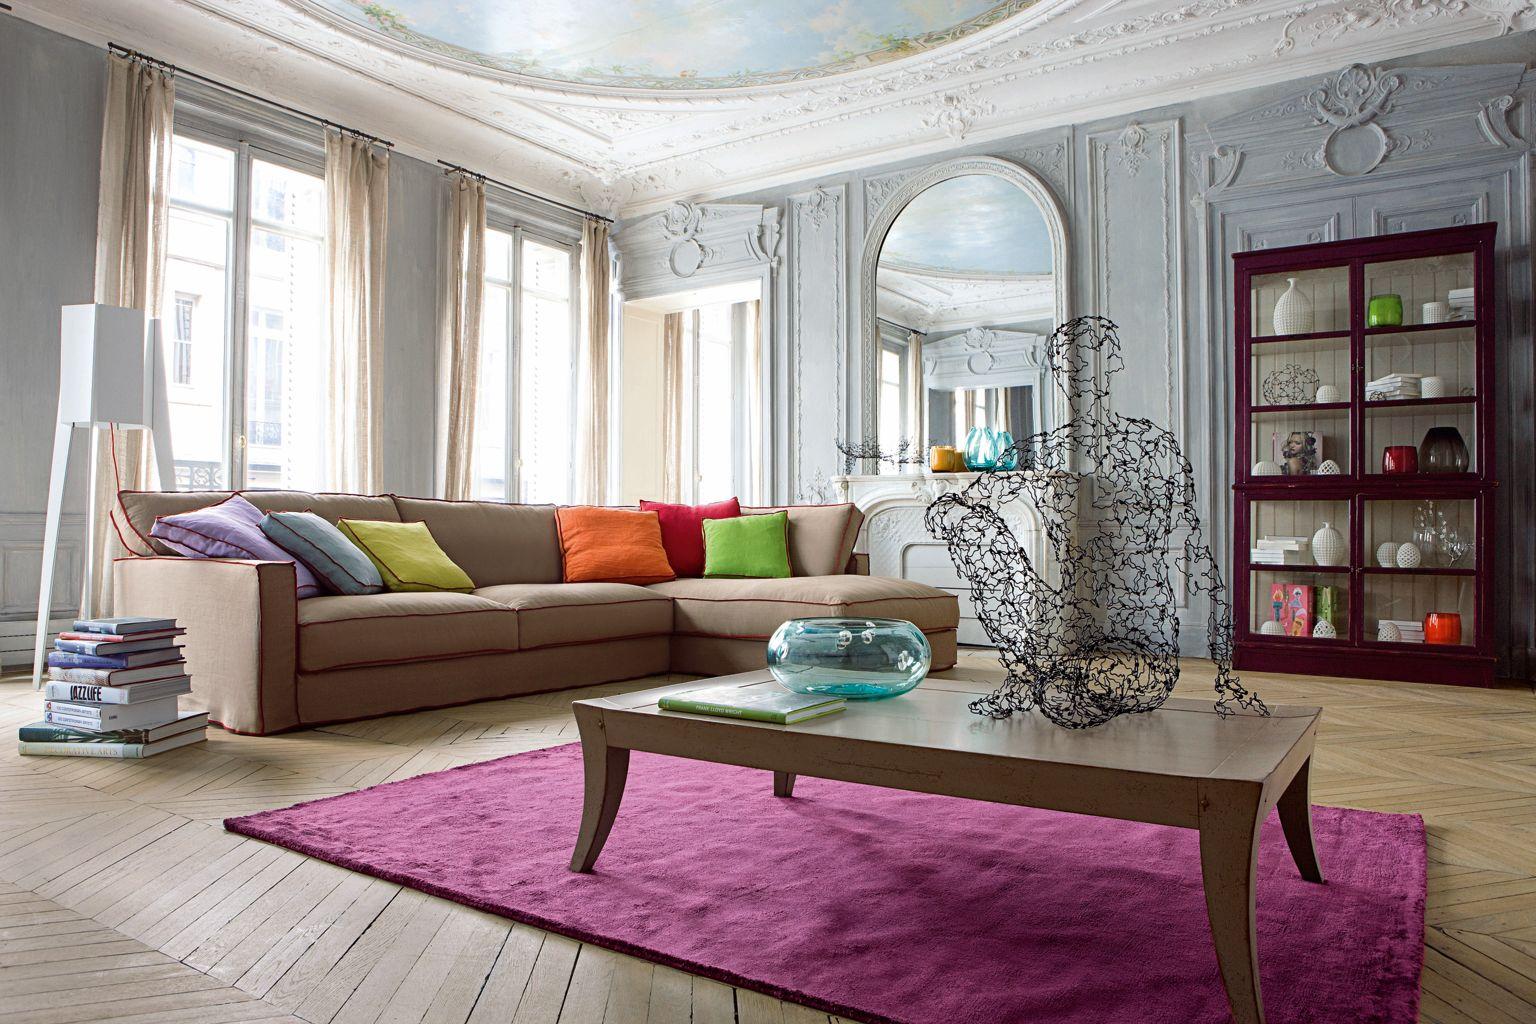 Strange Long Island Large 3 Seat Sofa Roche Bobois Interior Design Ideas Clesiryabchikinfo